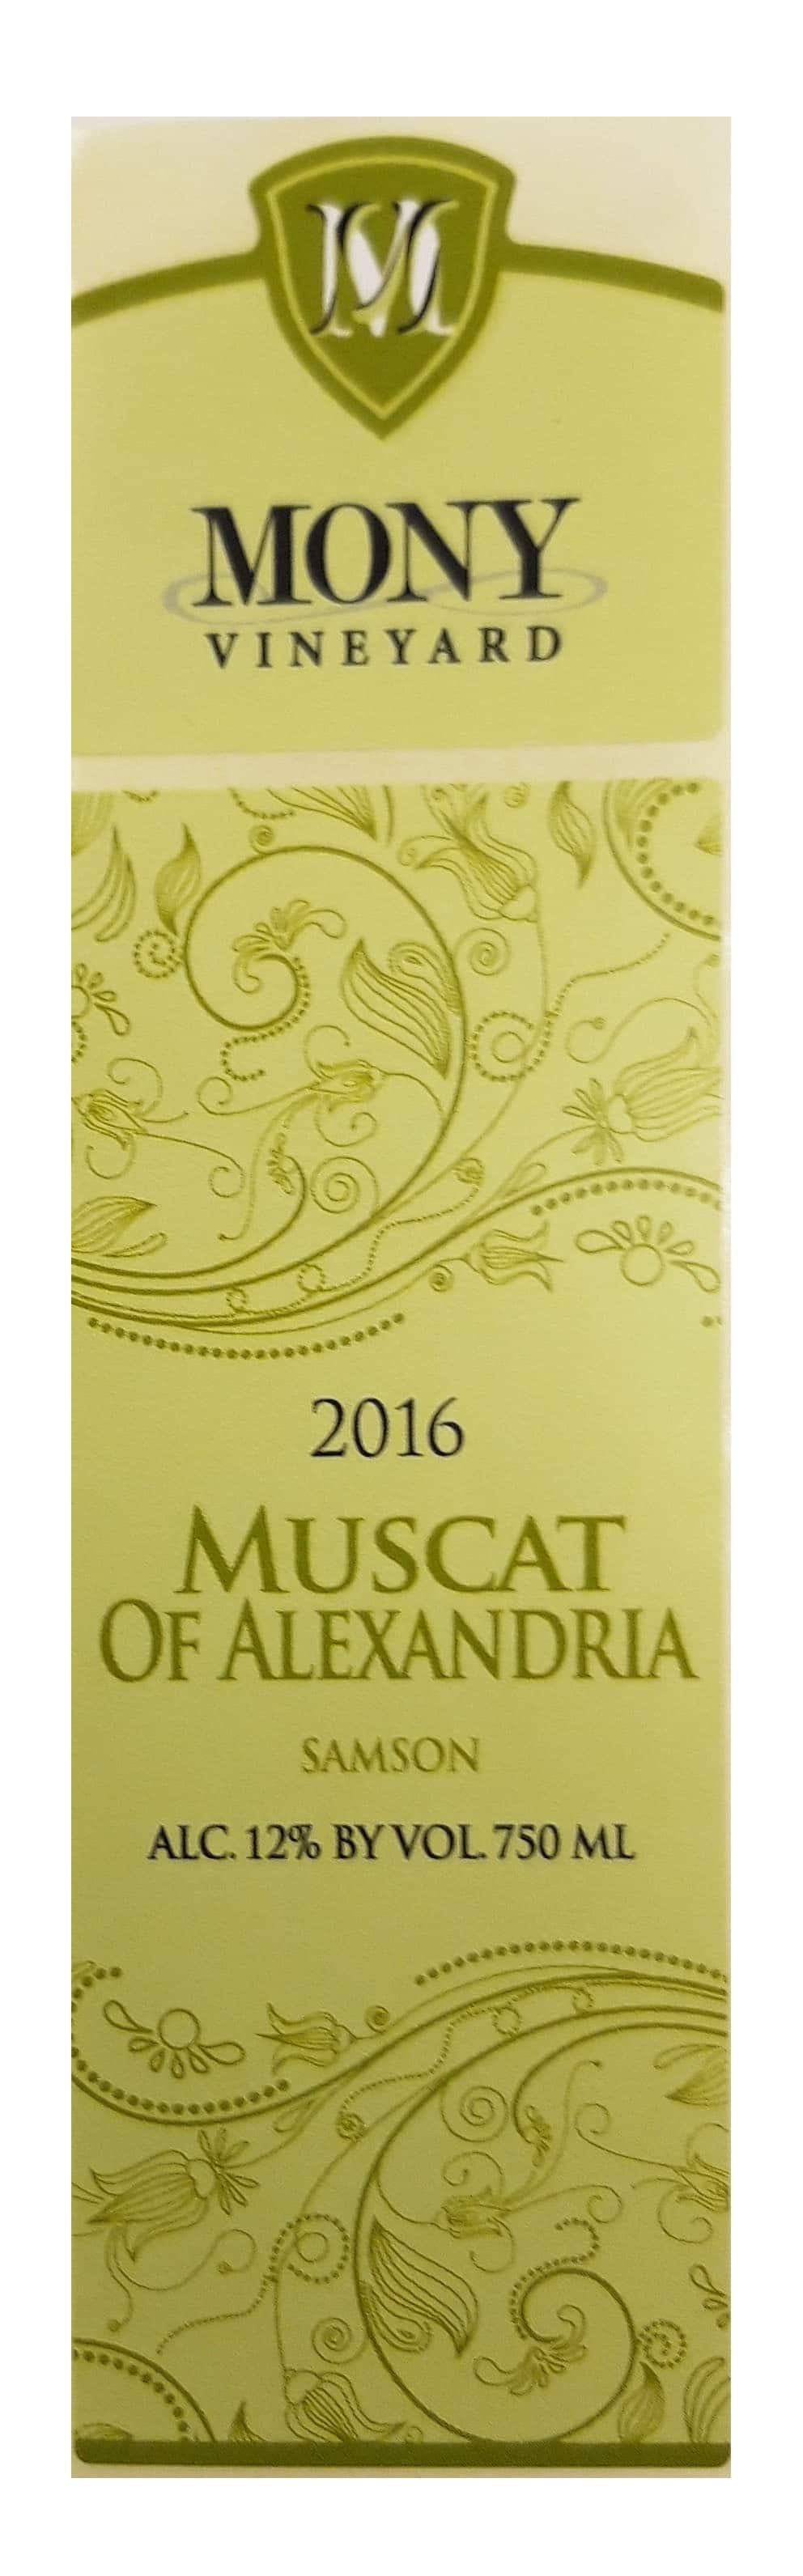 מארז יין - MUSCAT OF ALEXANDRIA